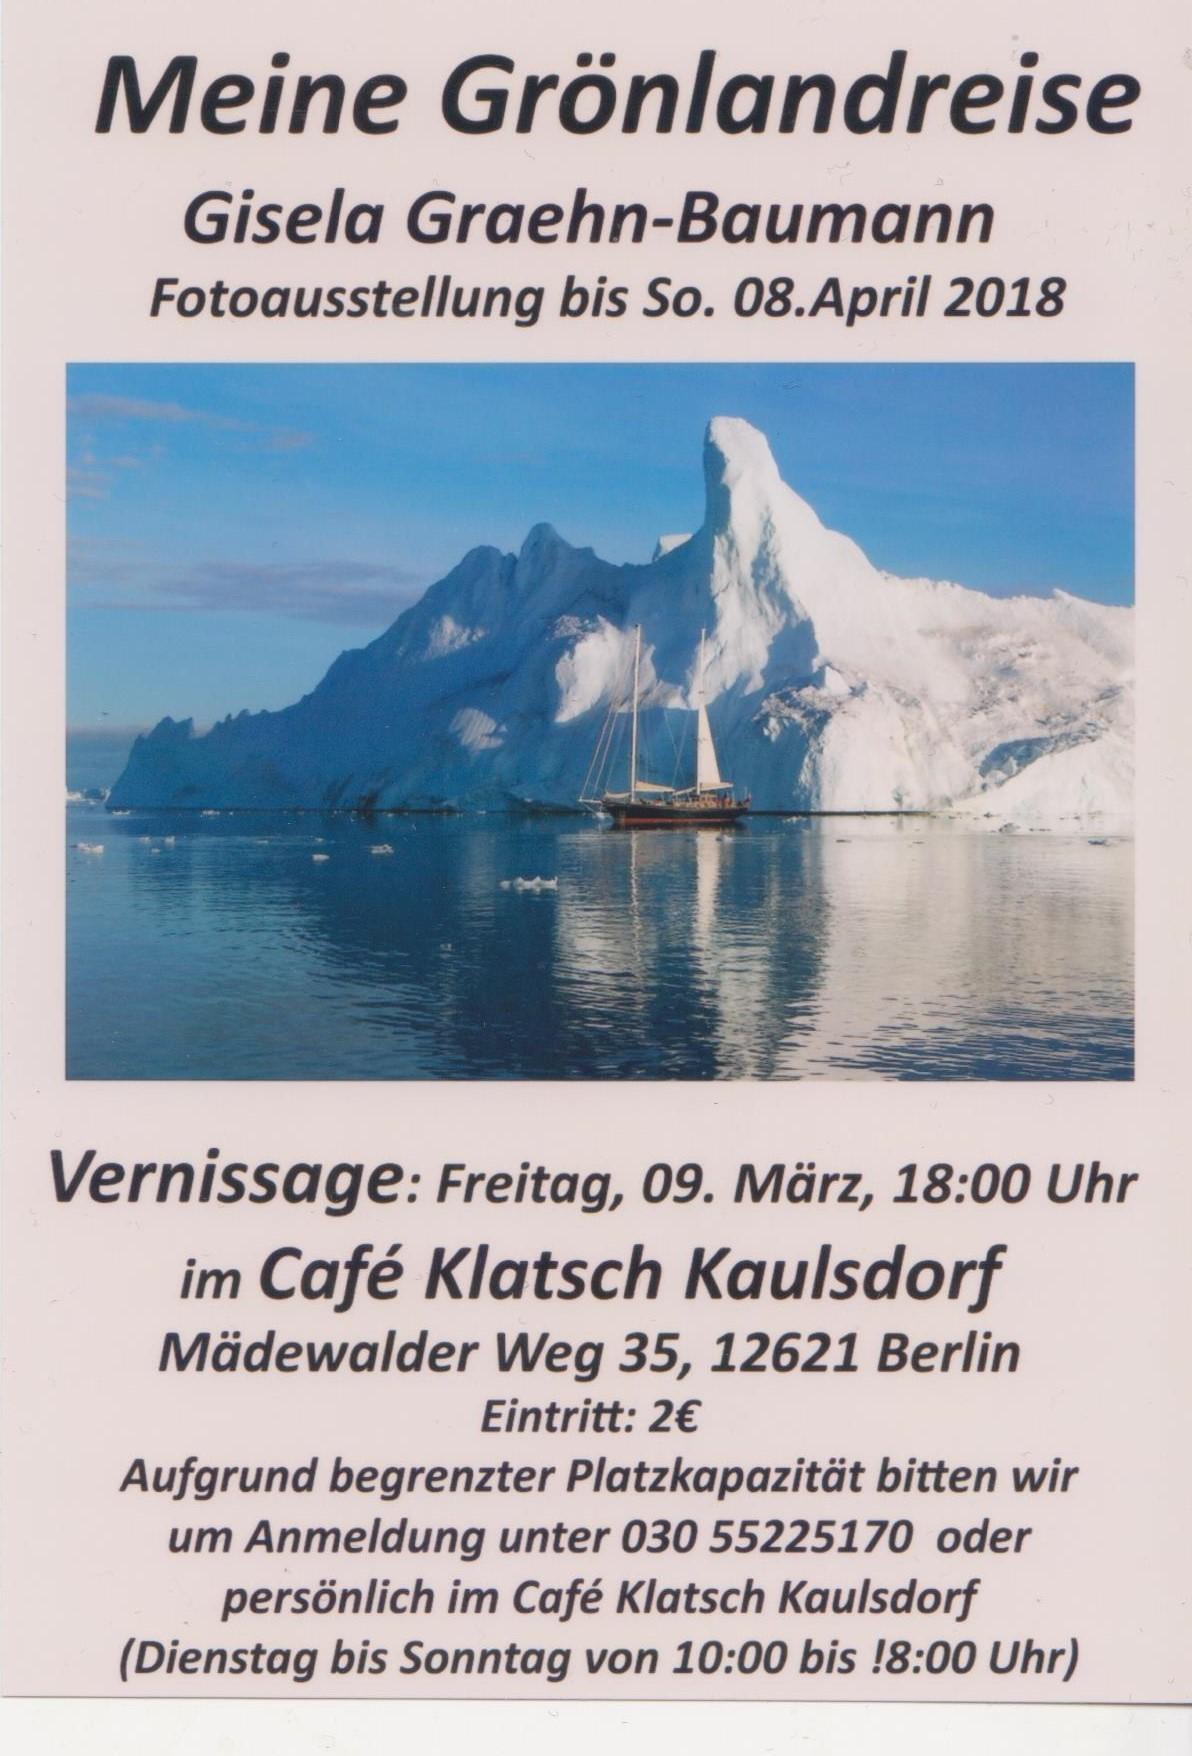 Flyer: Gisela Graehn-Baumann